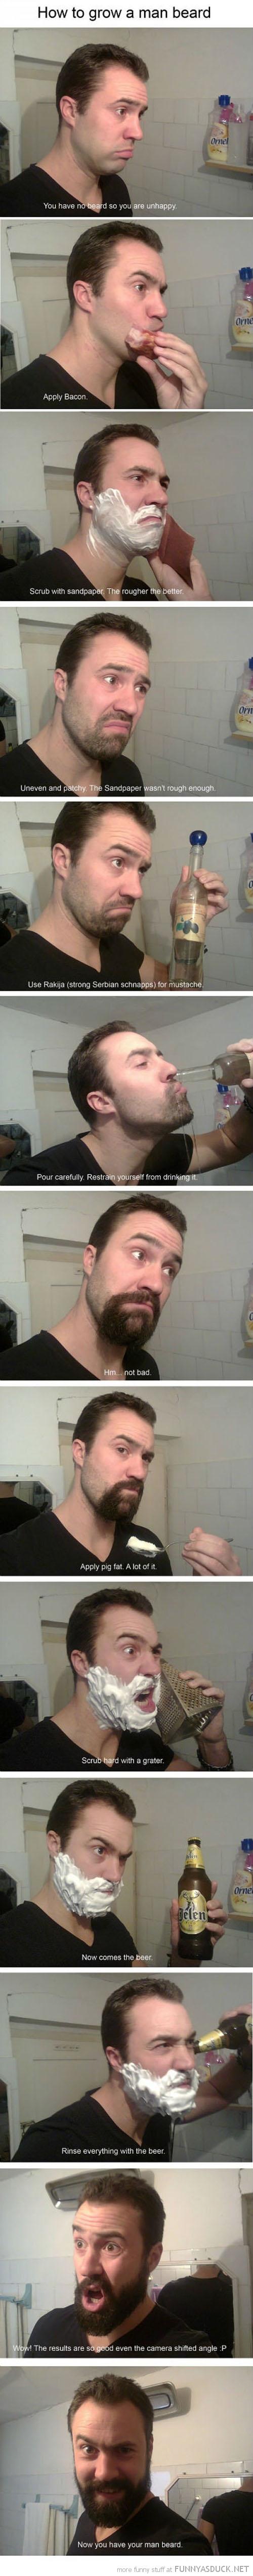 Grow A Man Beard